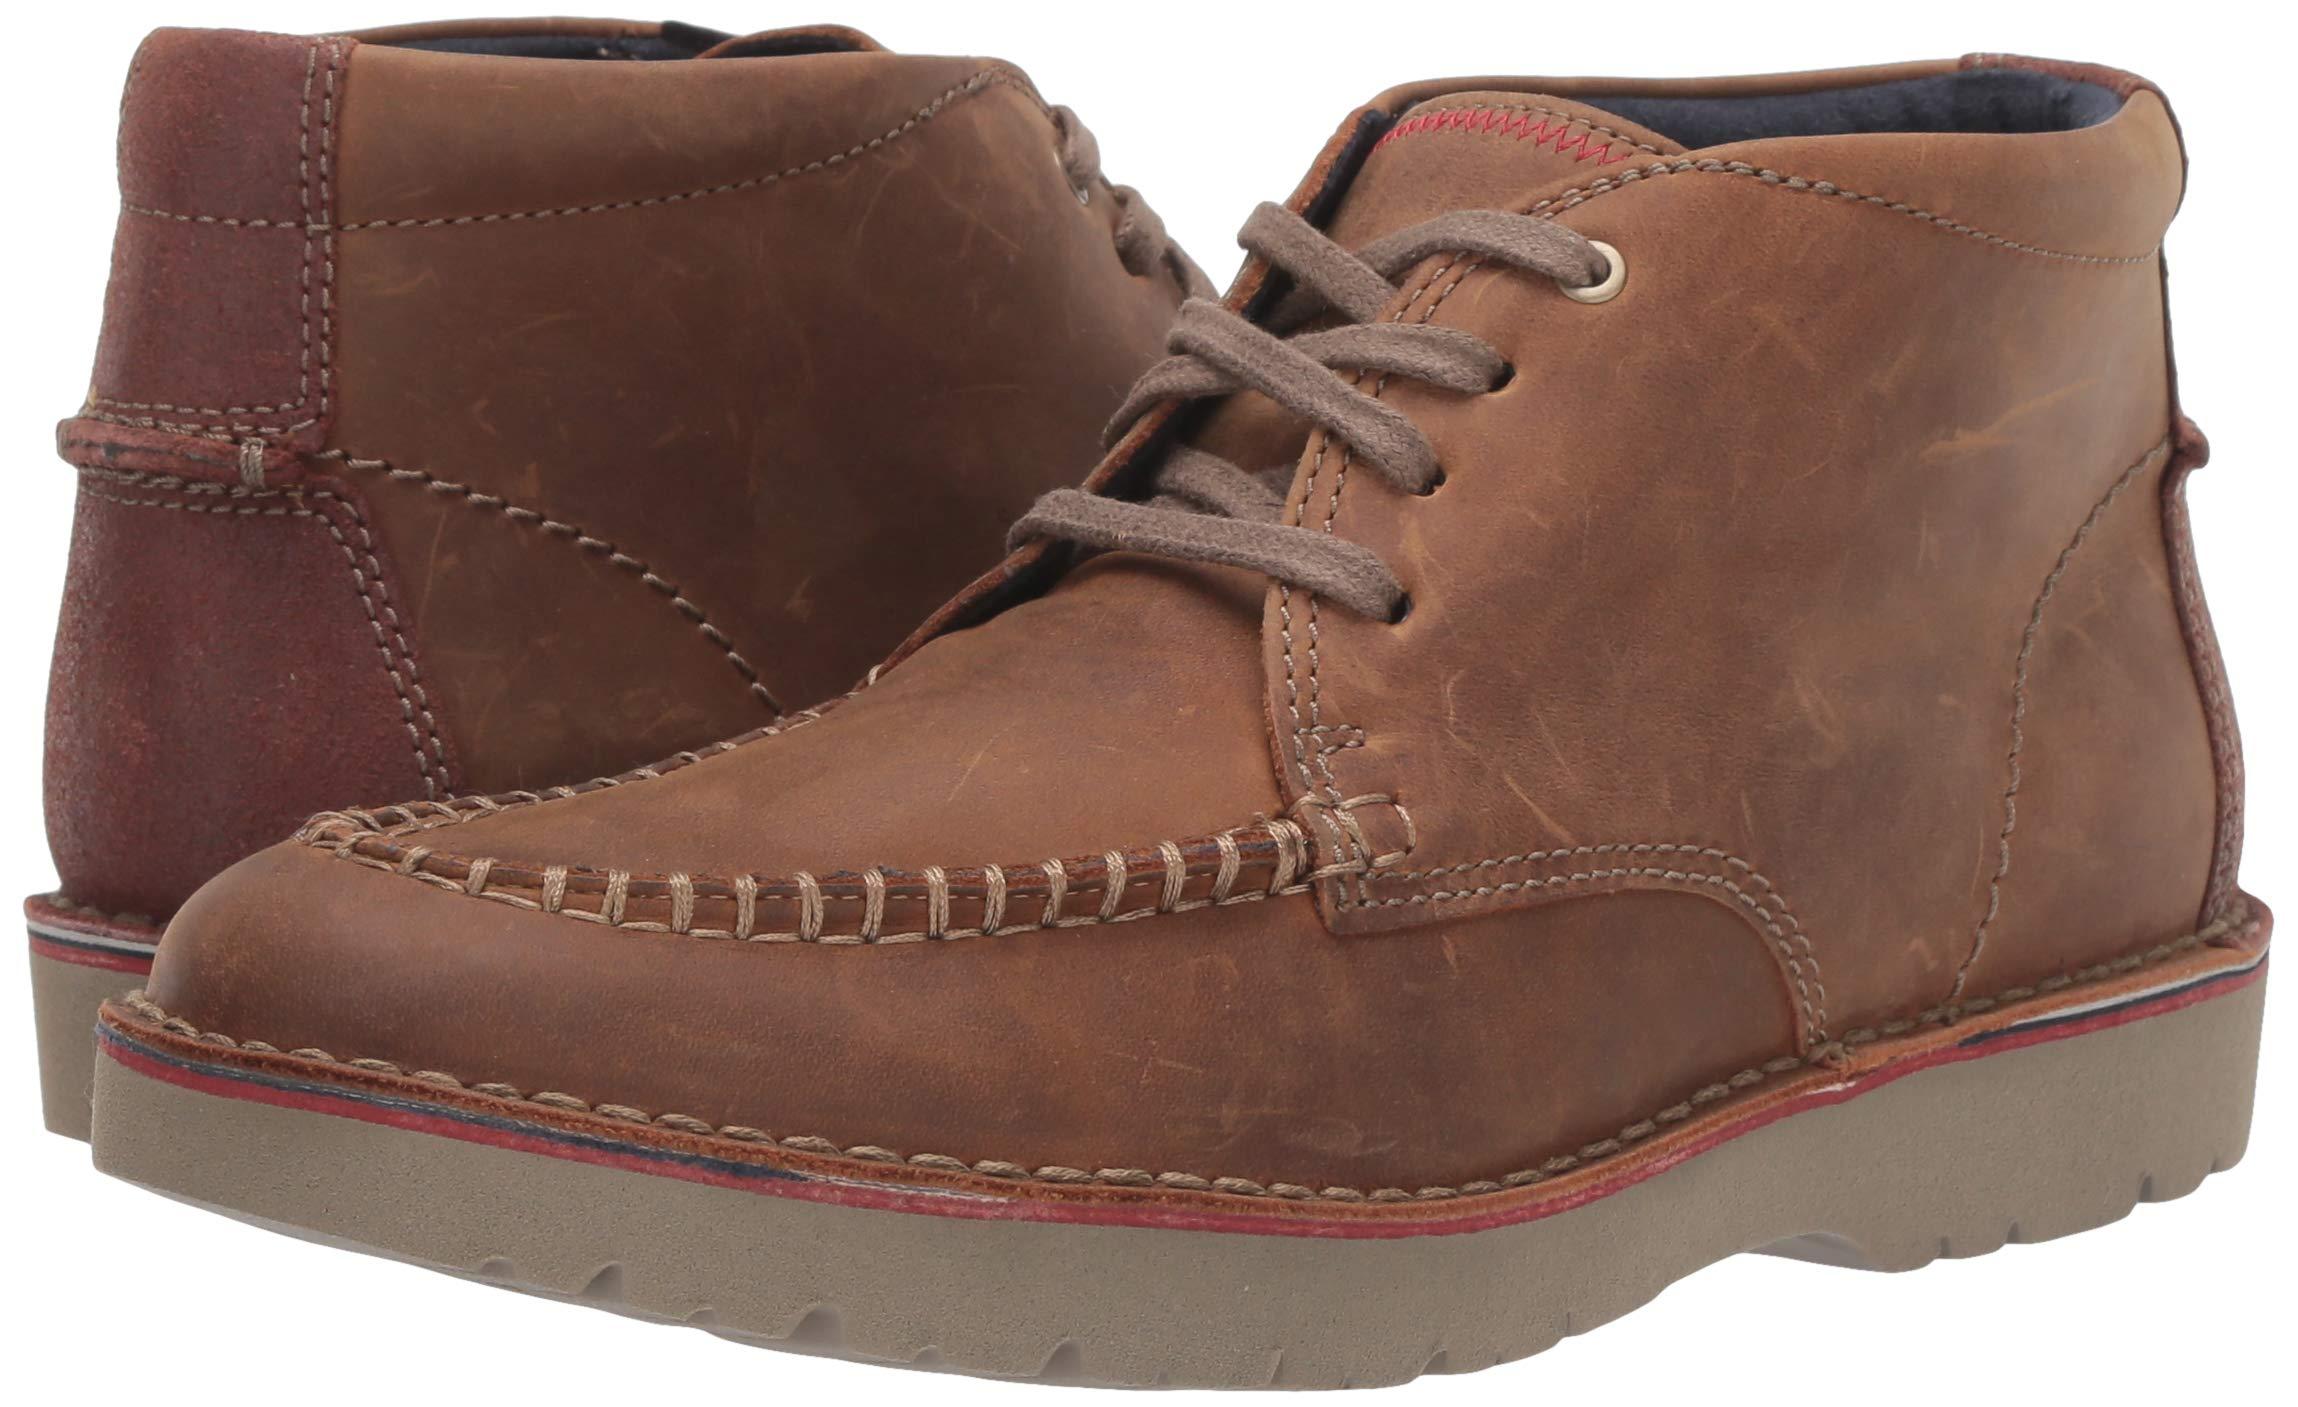 Clarks Men's Vargo Apron Ankle Boot 6